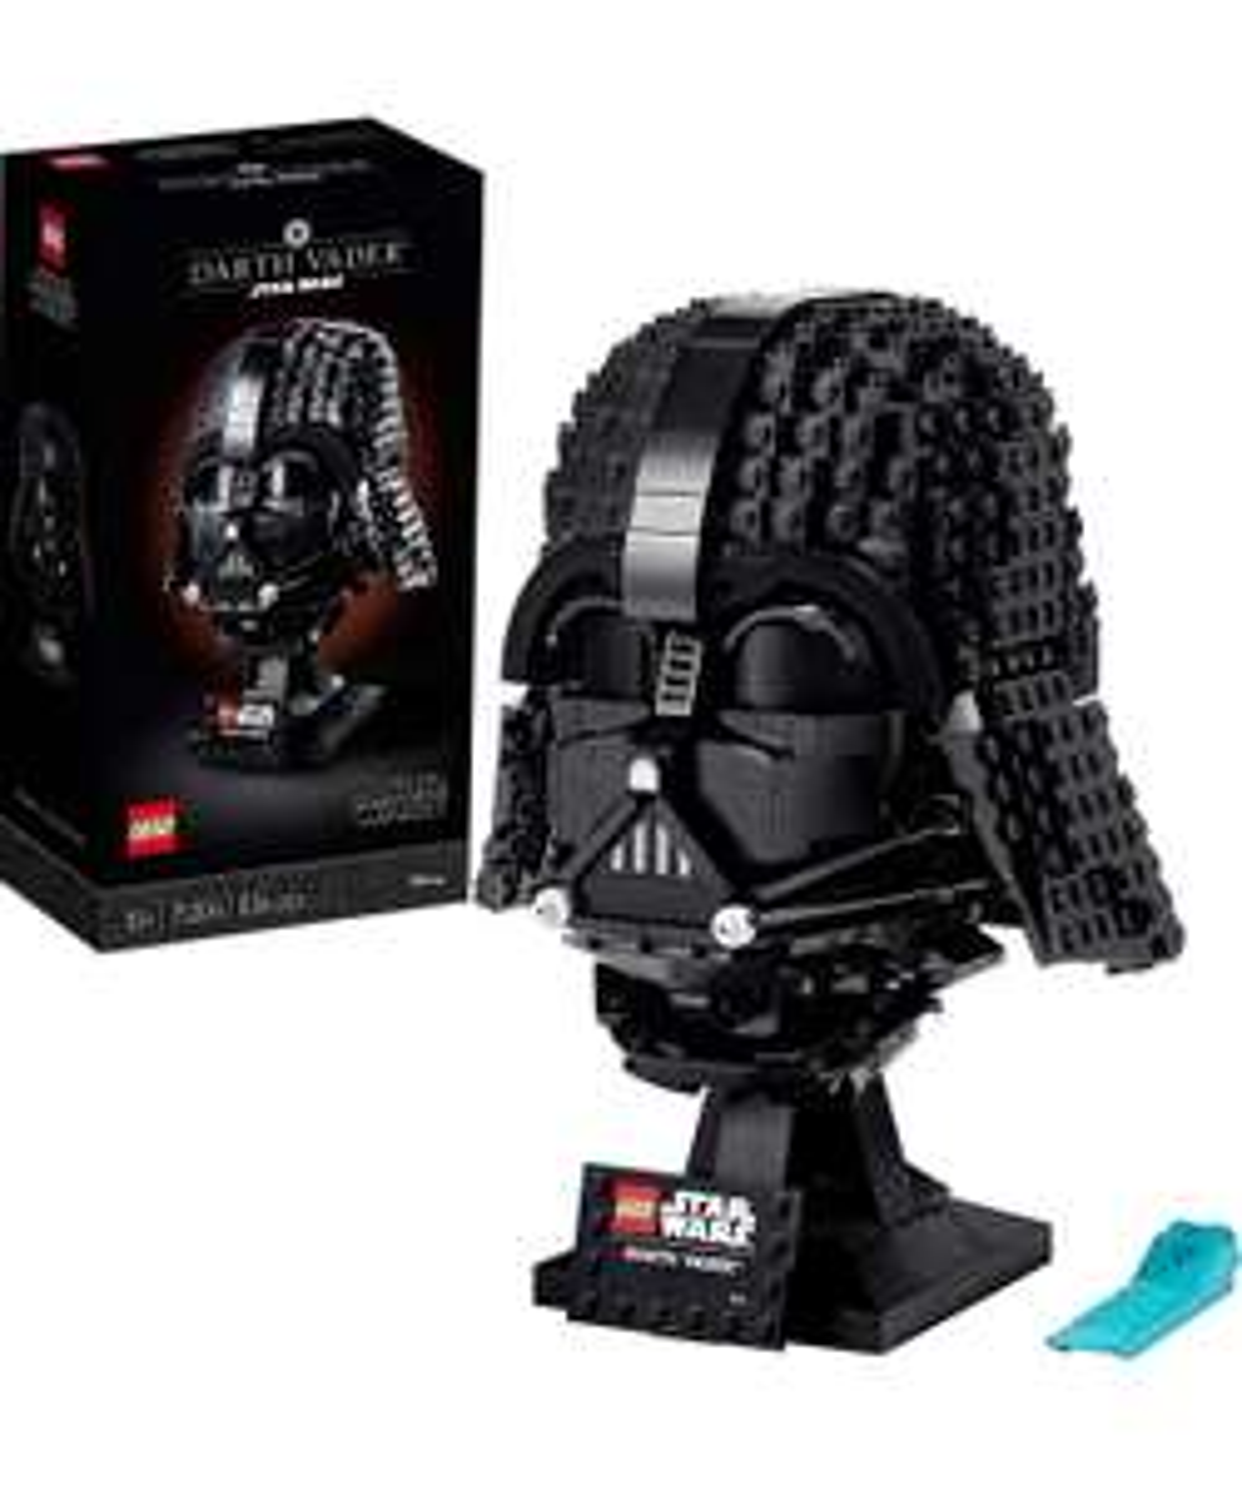 LEGO Star Wars 75304 Darth Vader Helmet Set for Adults / LEGO 75306 Imperial Probe Droid Adult Building Set £49.99 each at Smyths Toys